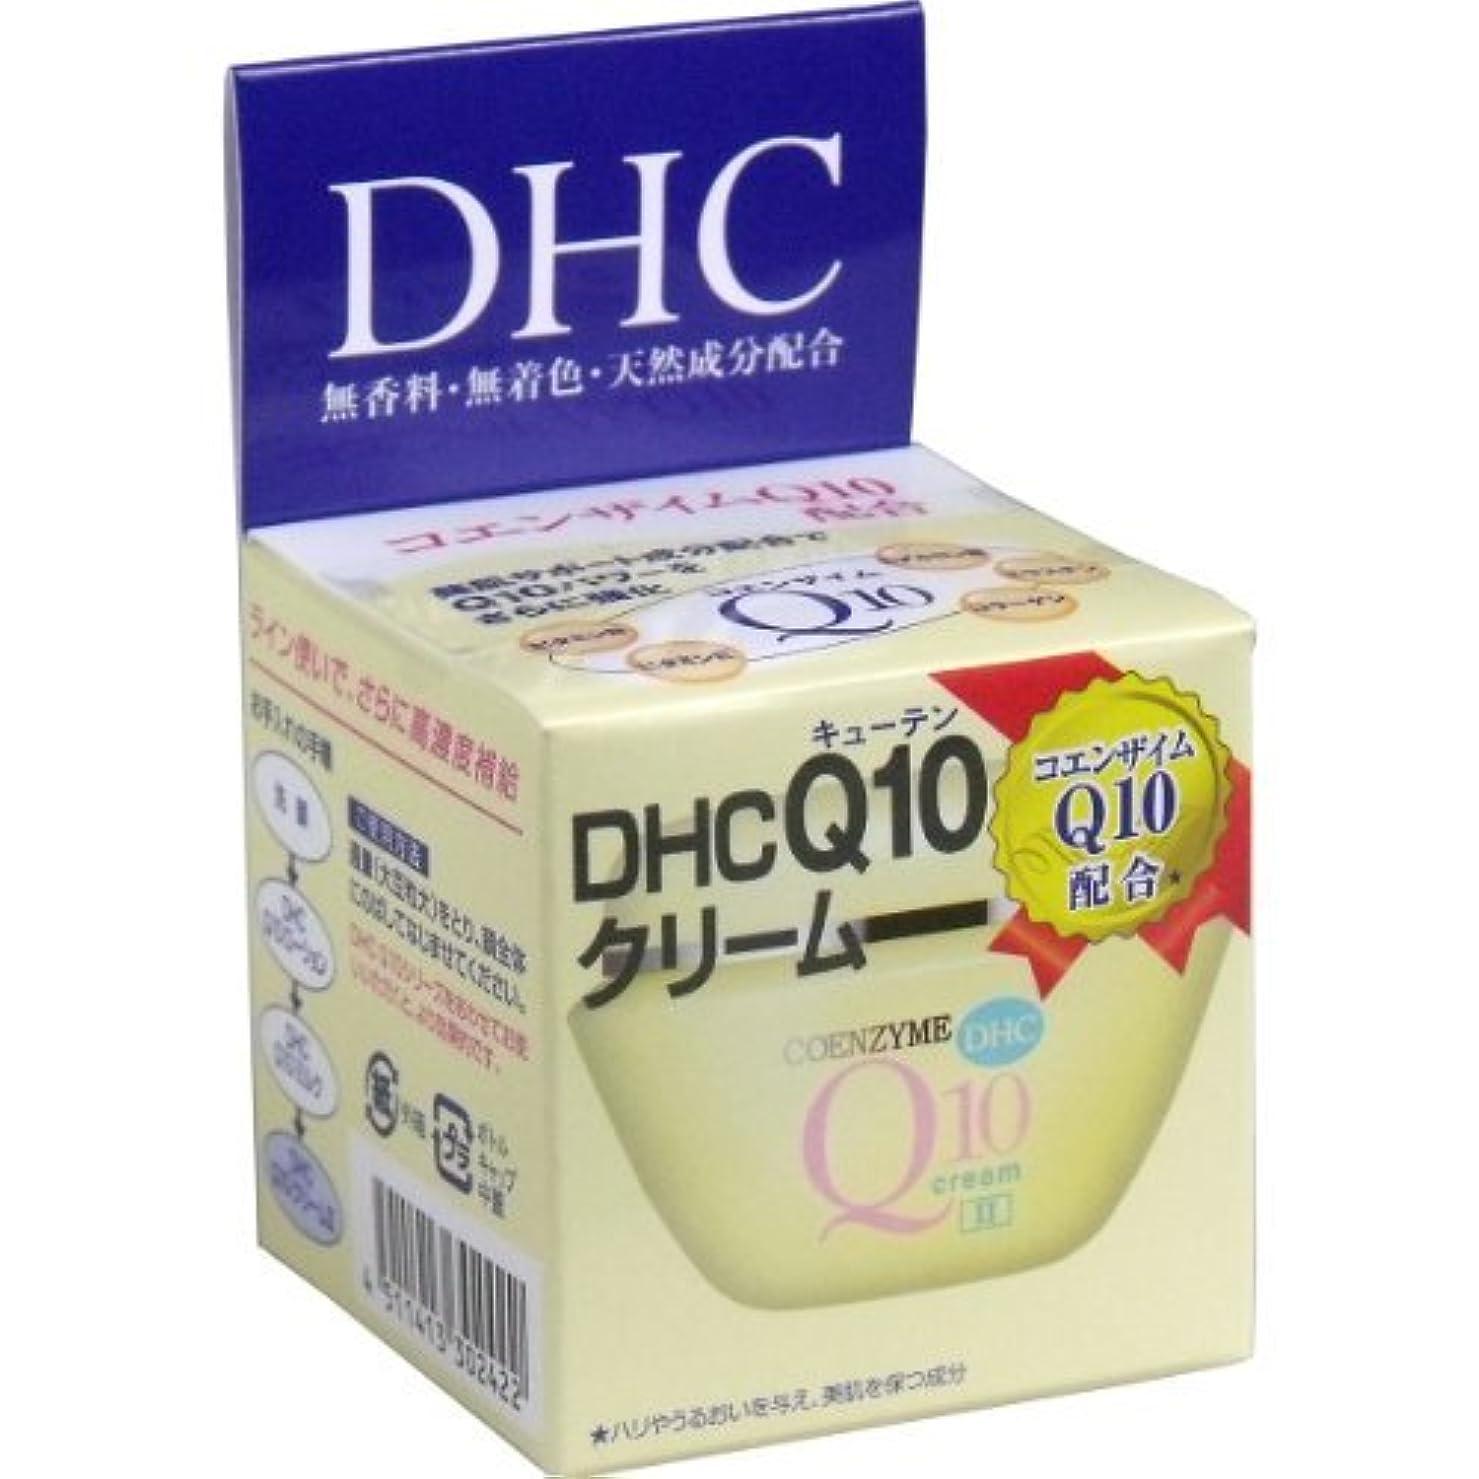 【DHC】DHC Q10クリーム2 (SS) 20g ×5個セット